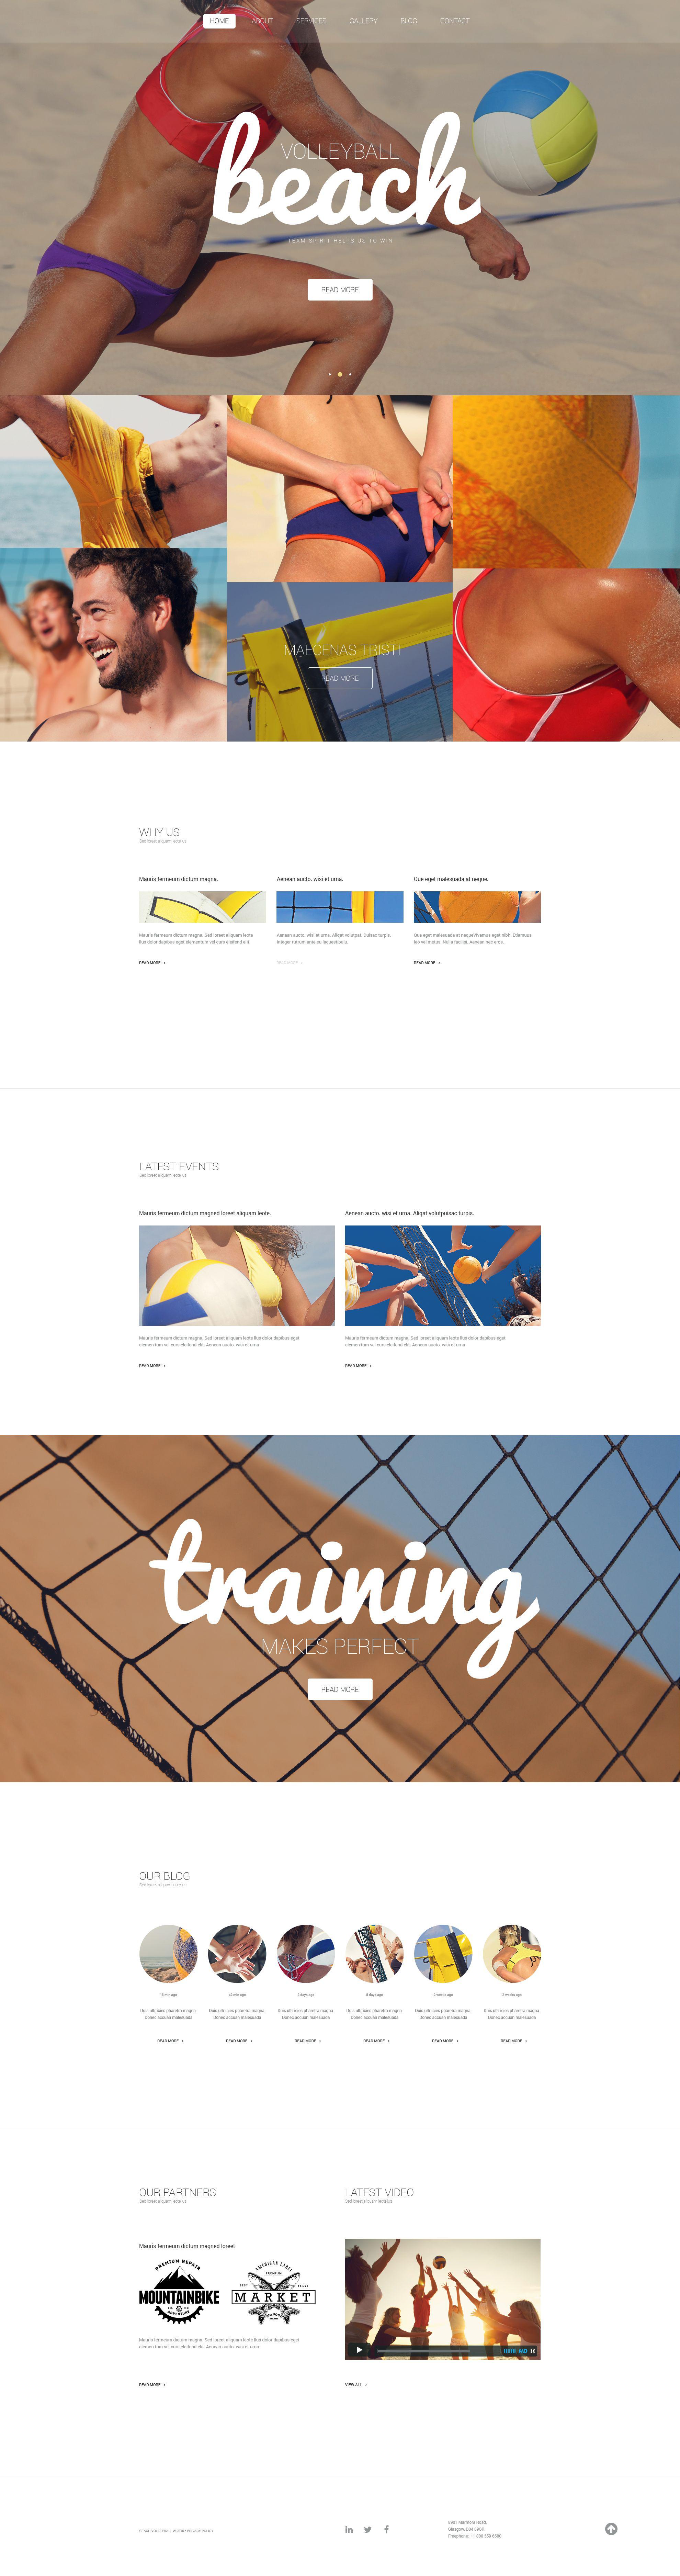 """Beach Volleyball Club"" thème WordPress adaptatif #54788"